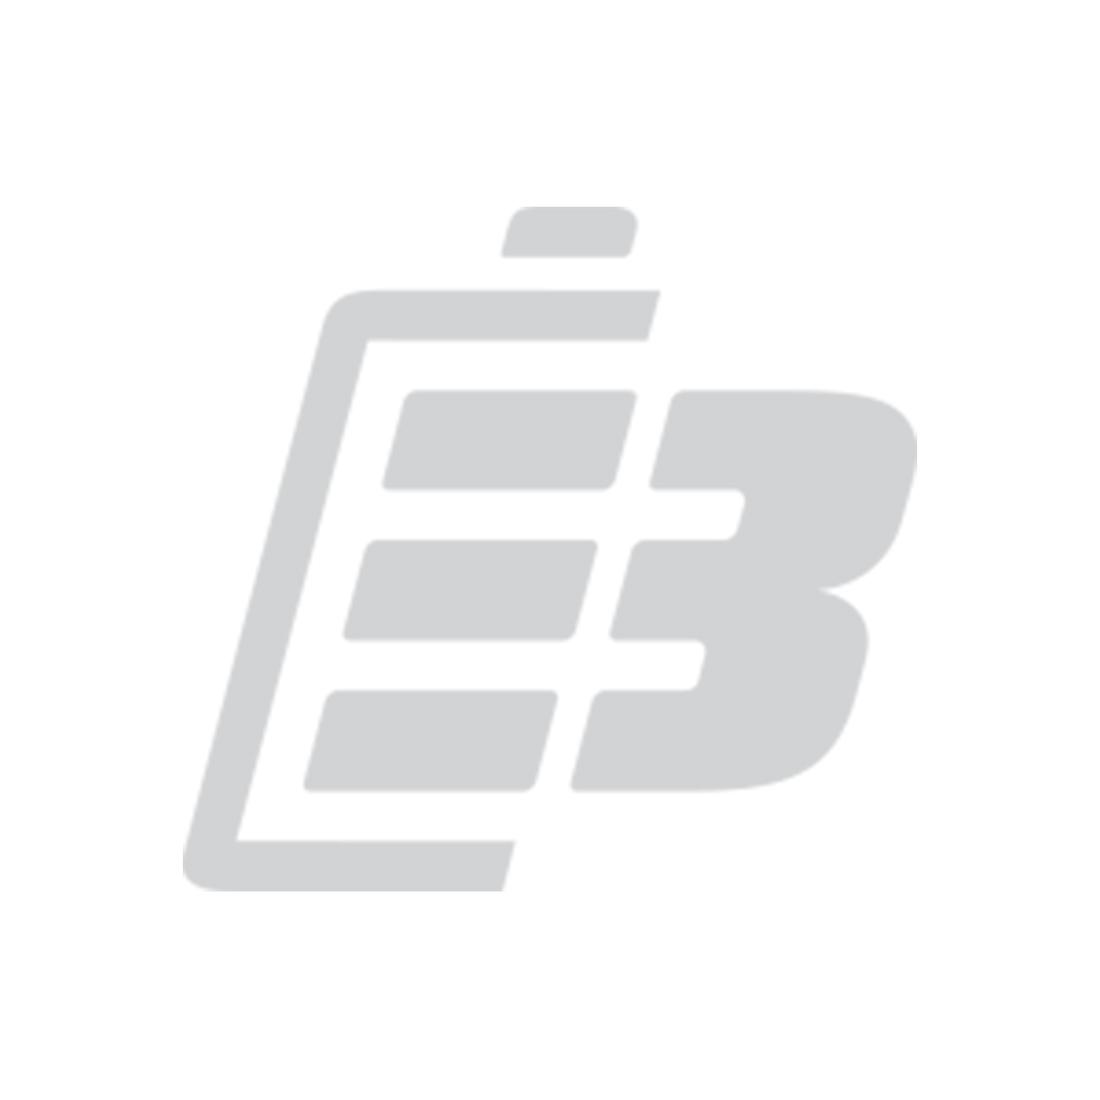 Laptop battery Asus UX50_1